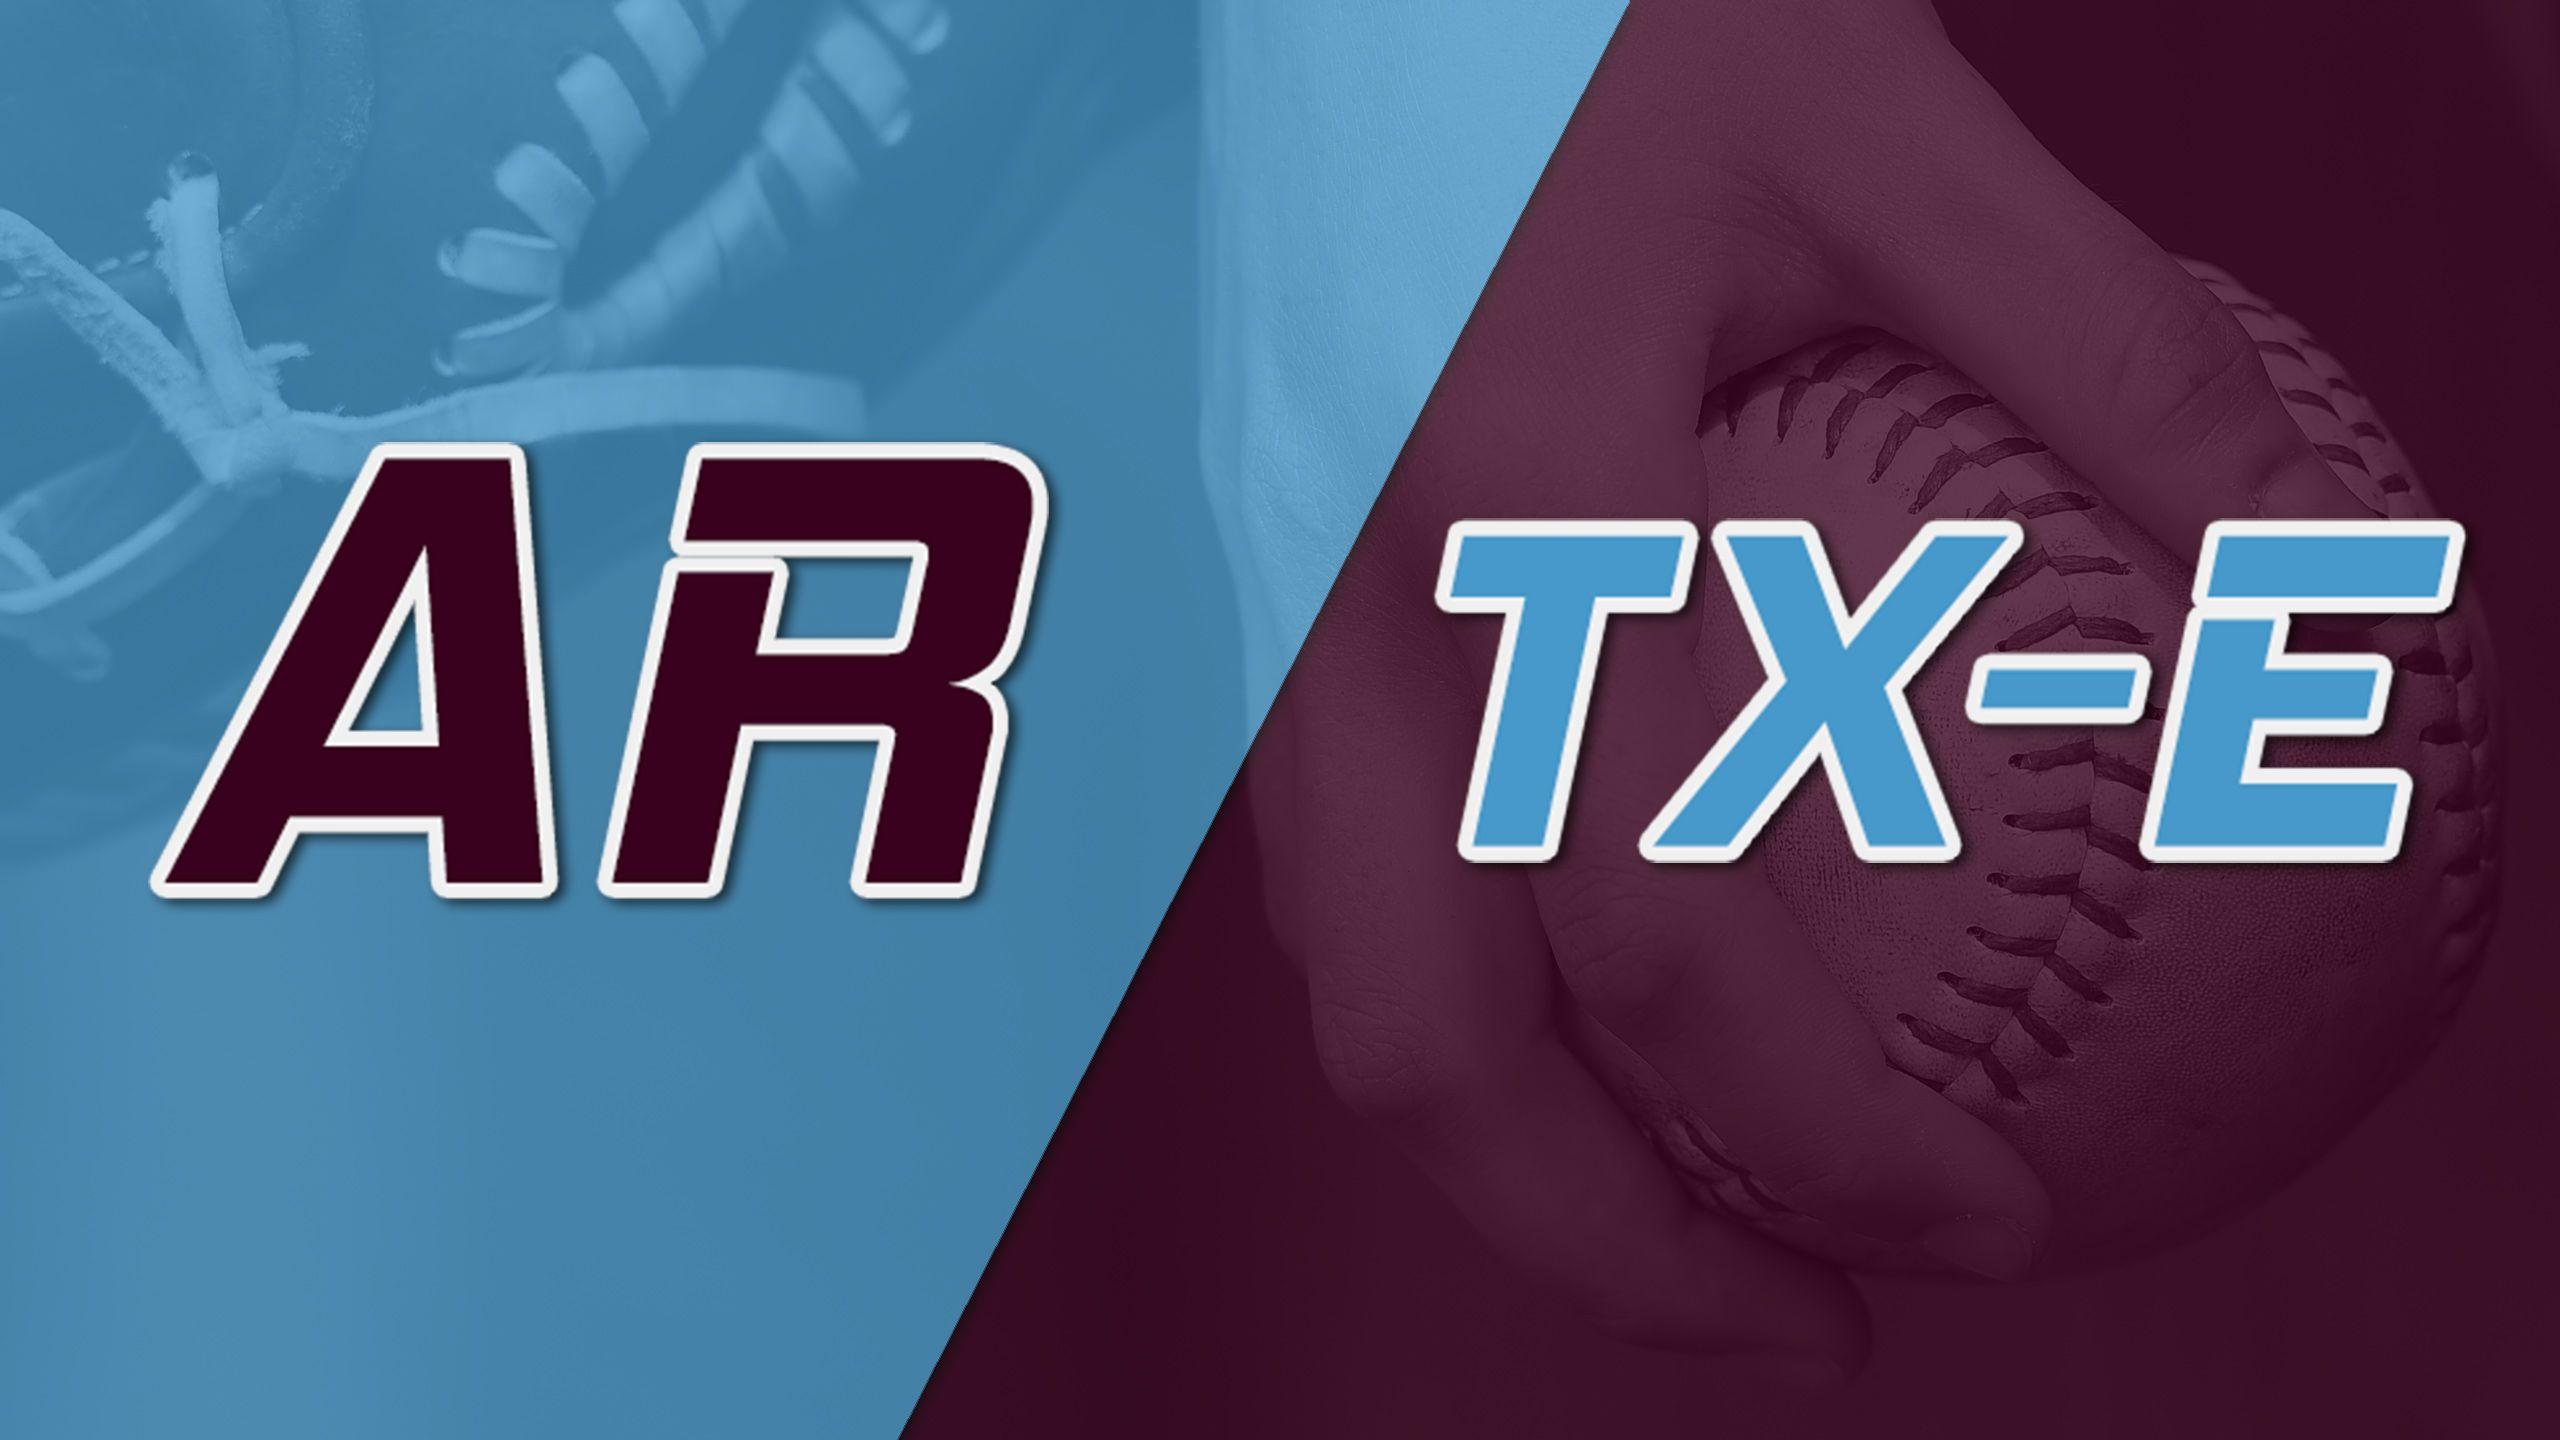 Pine Bluff, AR vs. Columbus, TX (Game #5) (2017 Softball LLWS)